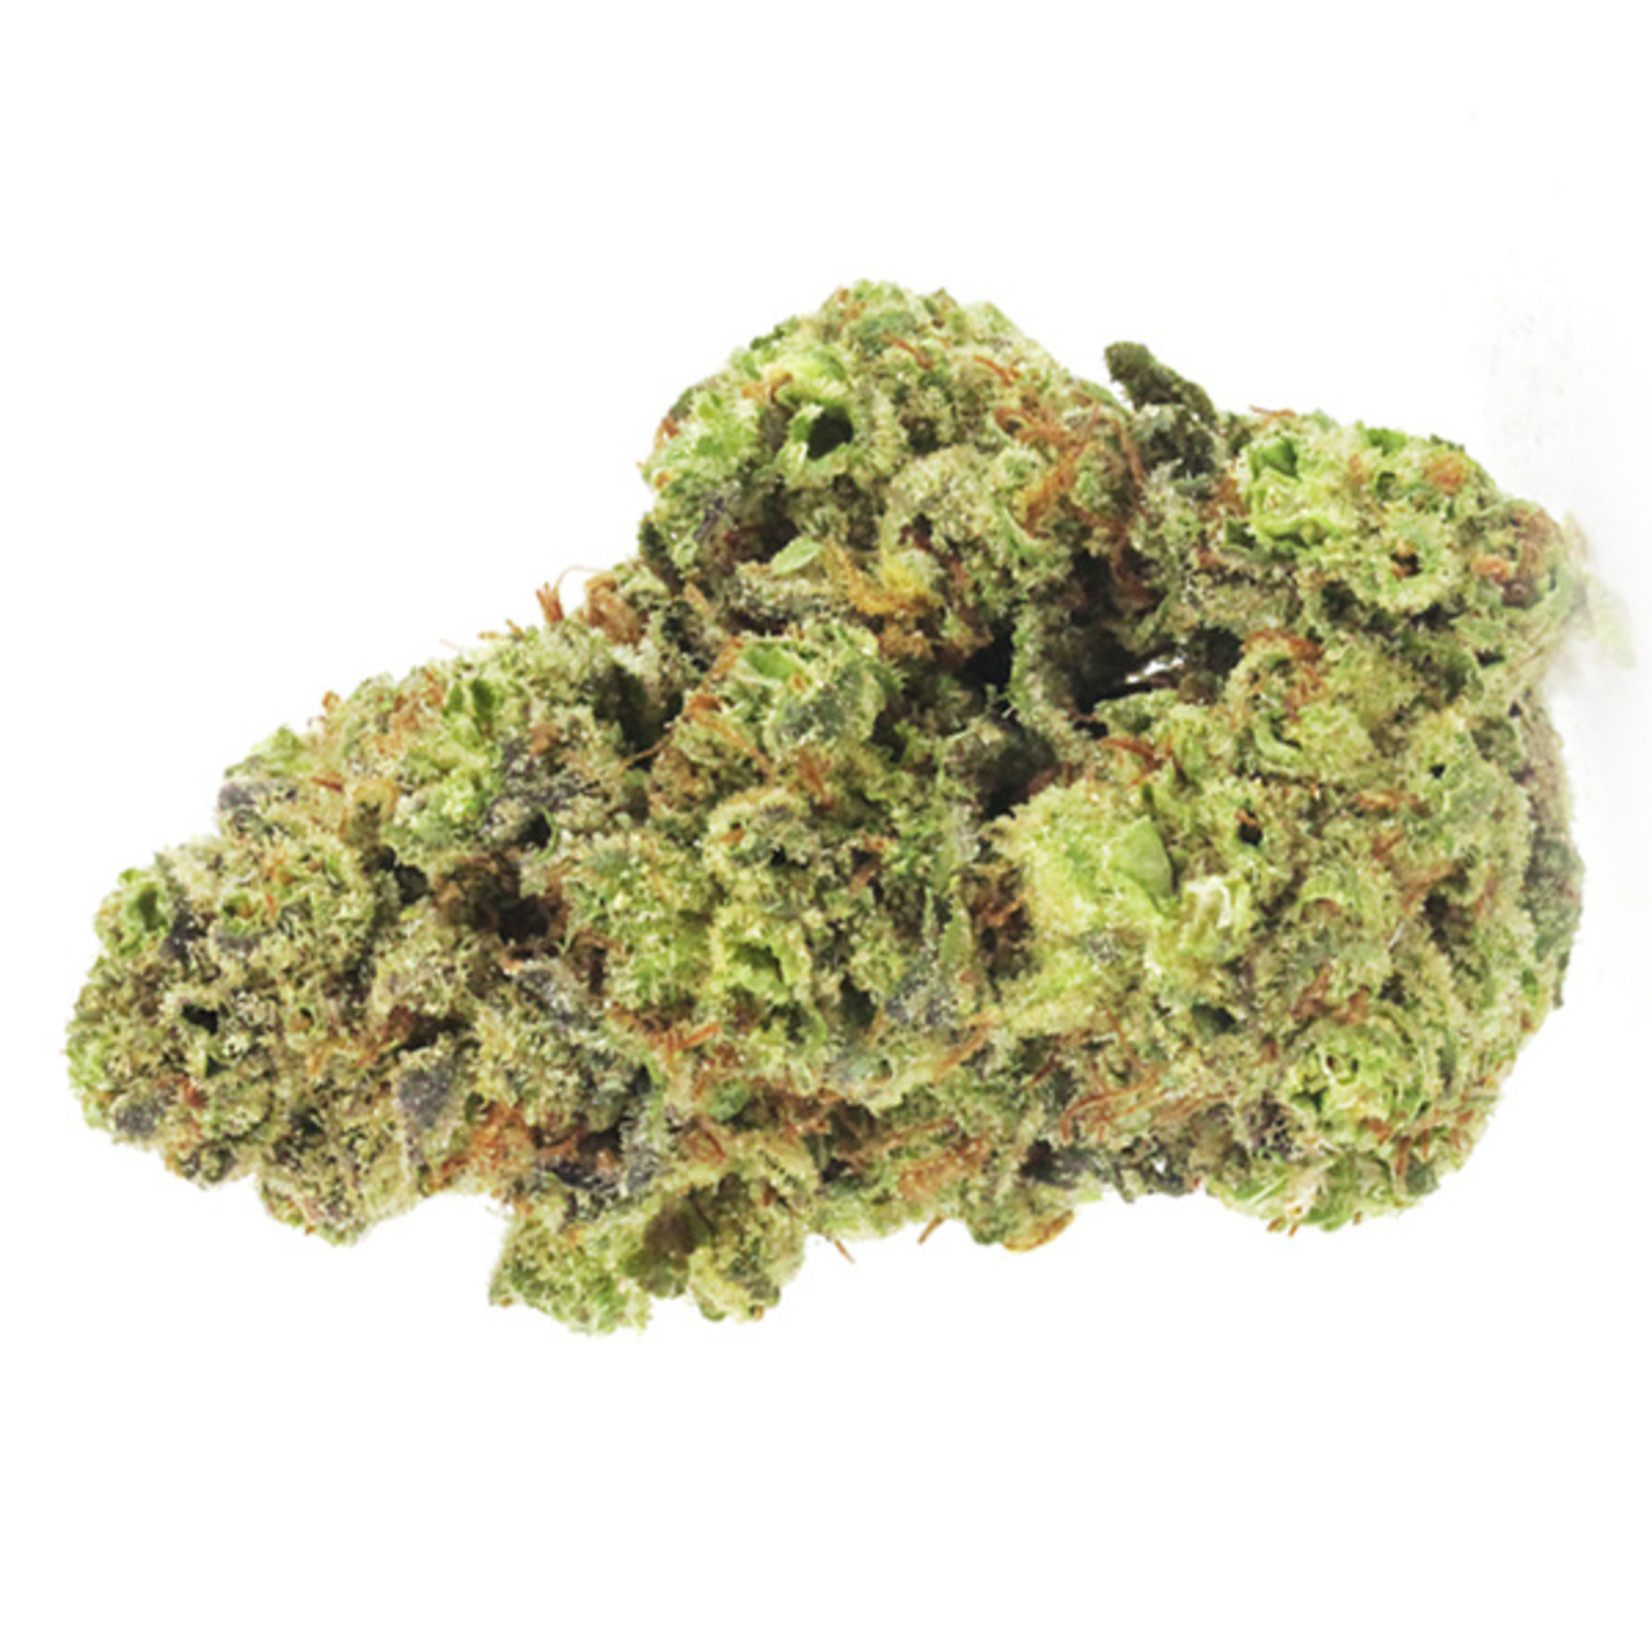 GMO Cookies cannabis seeds